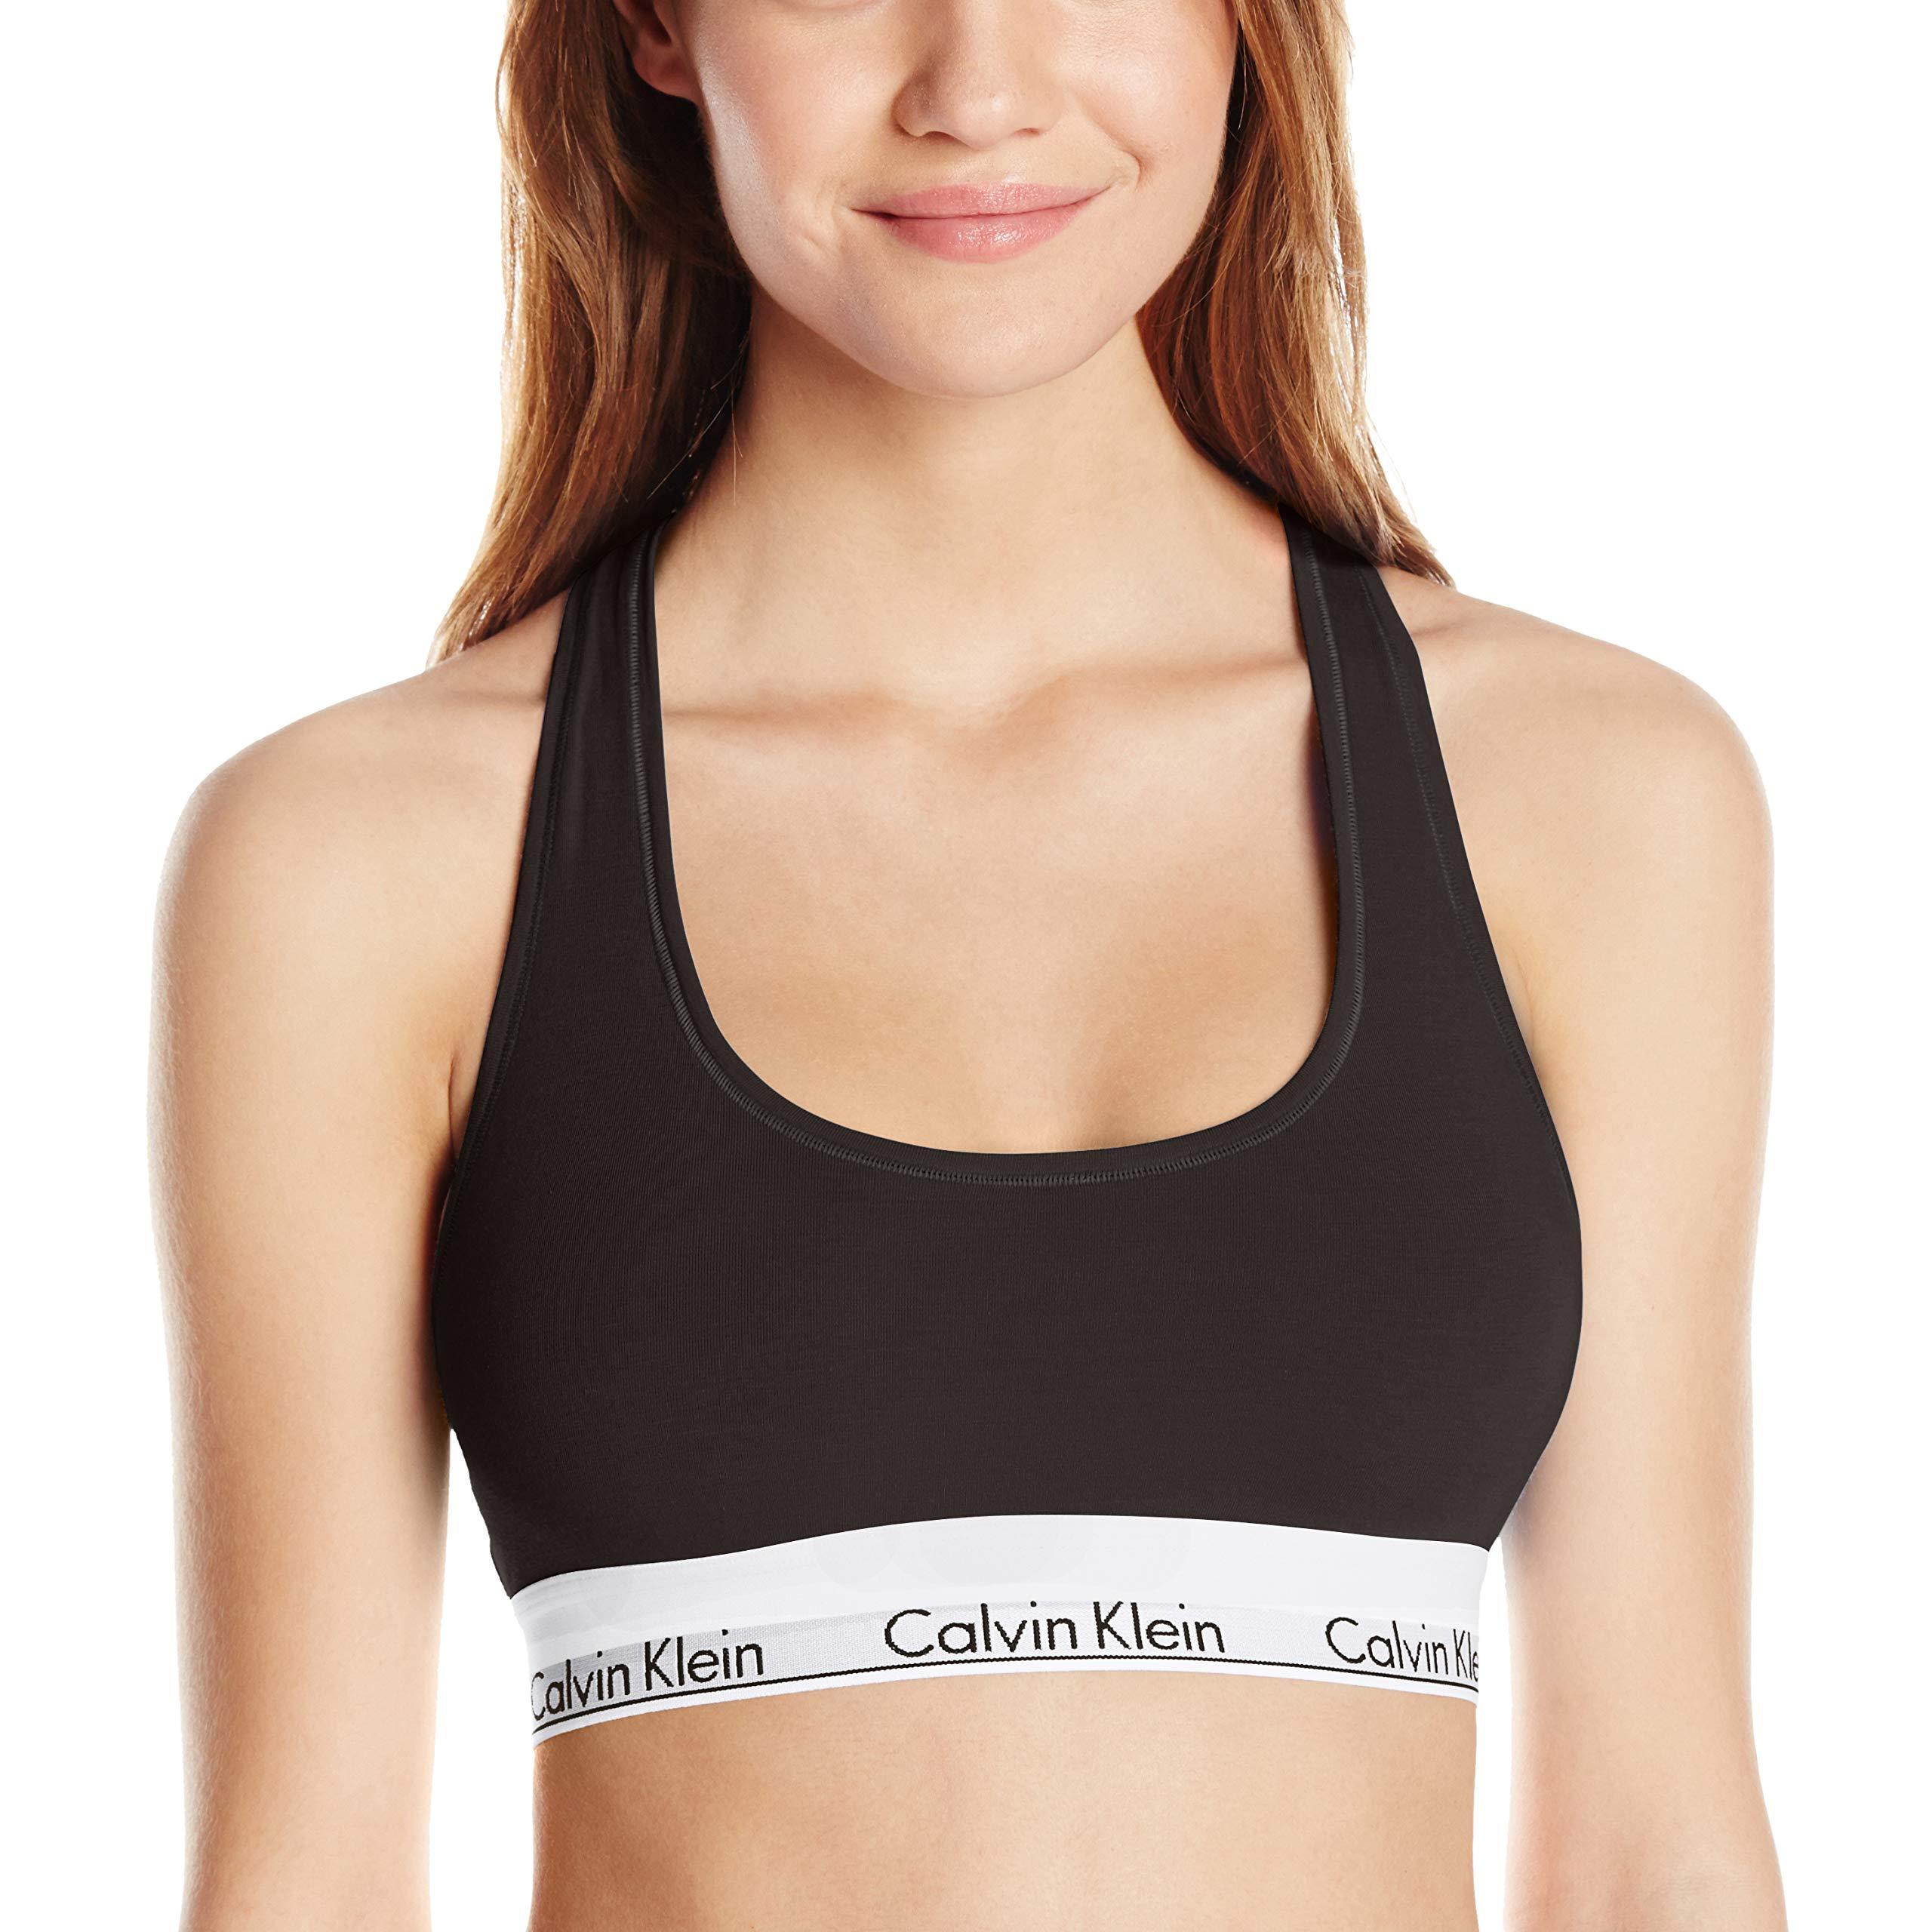 Calvin Klein Women's Plus Size Modern Cotton Bralette, Black, 2X